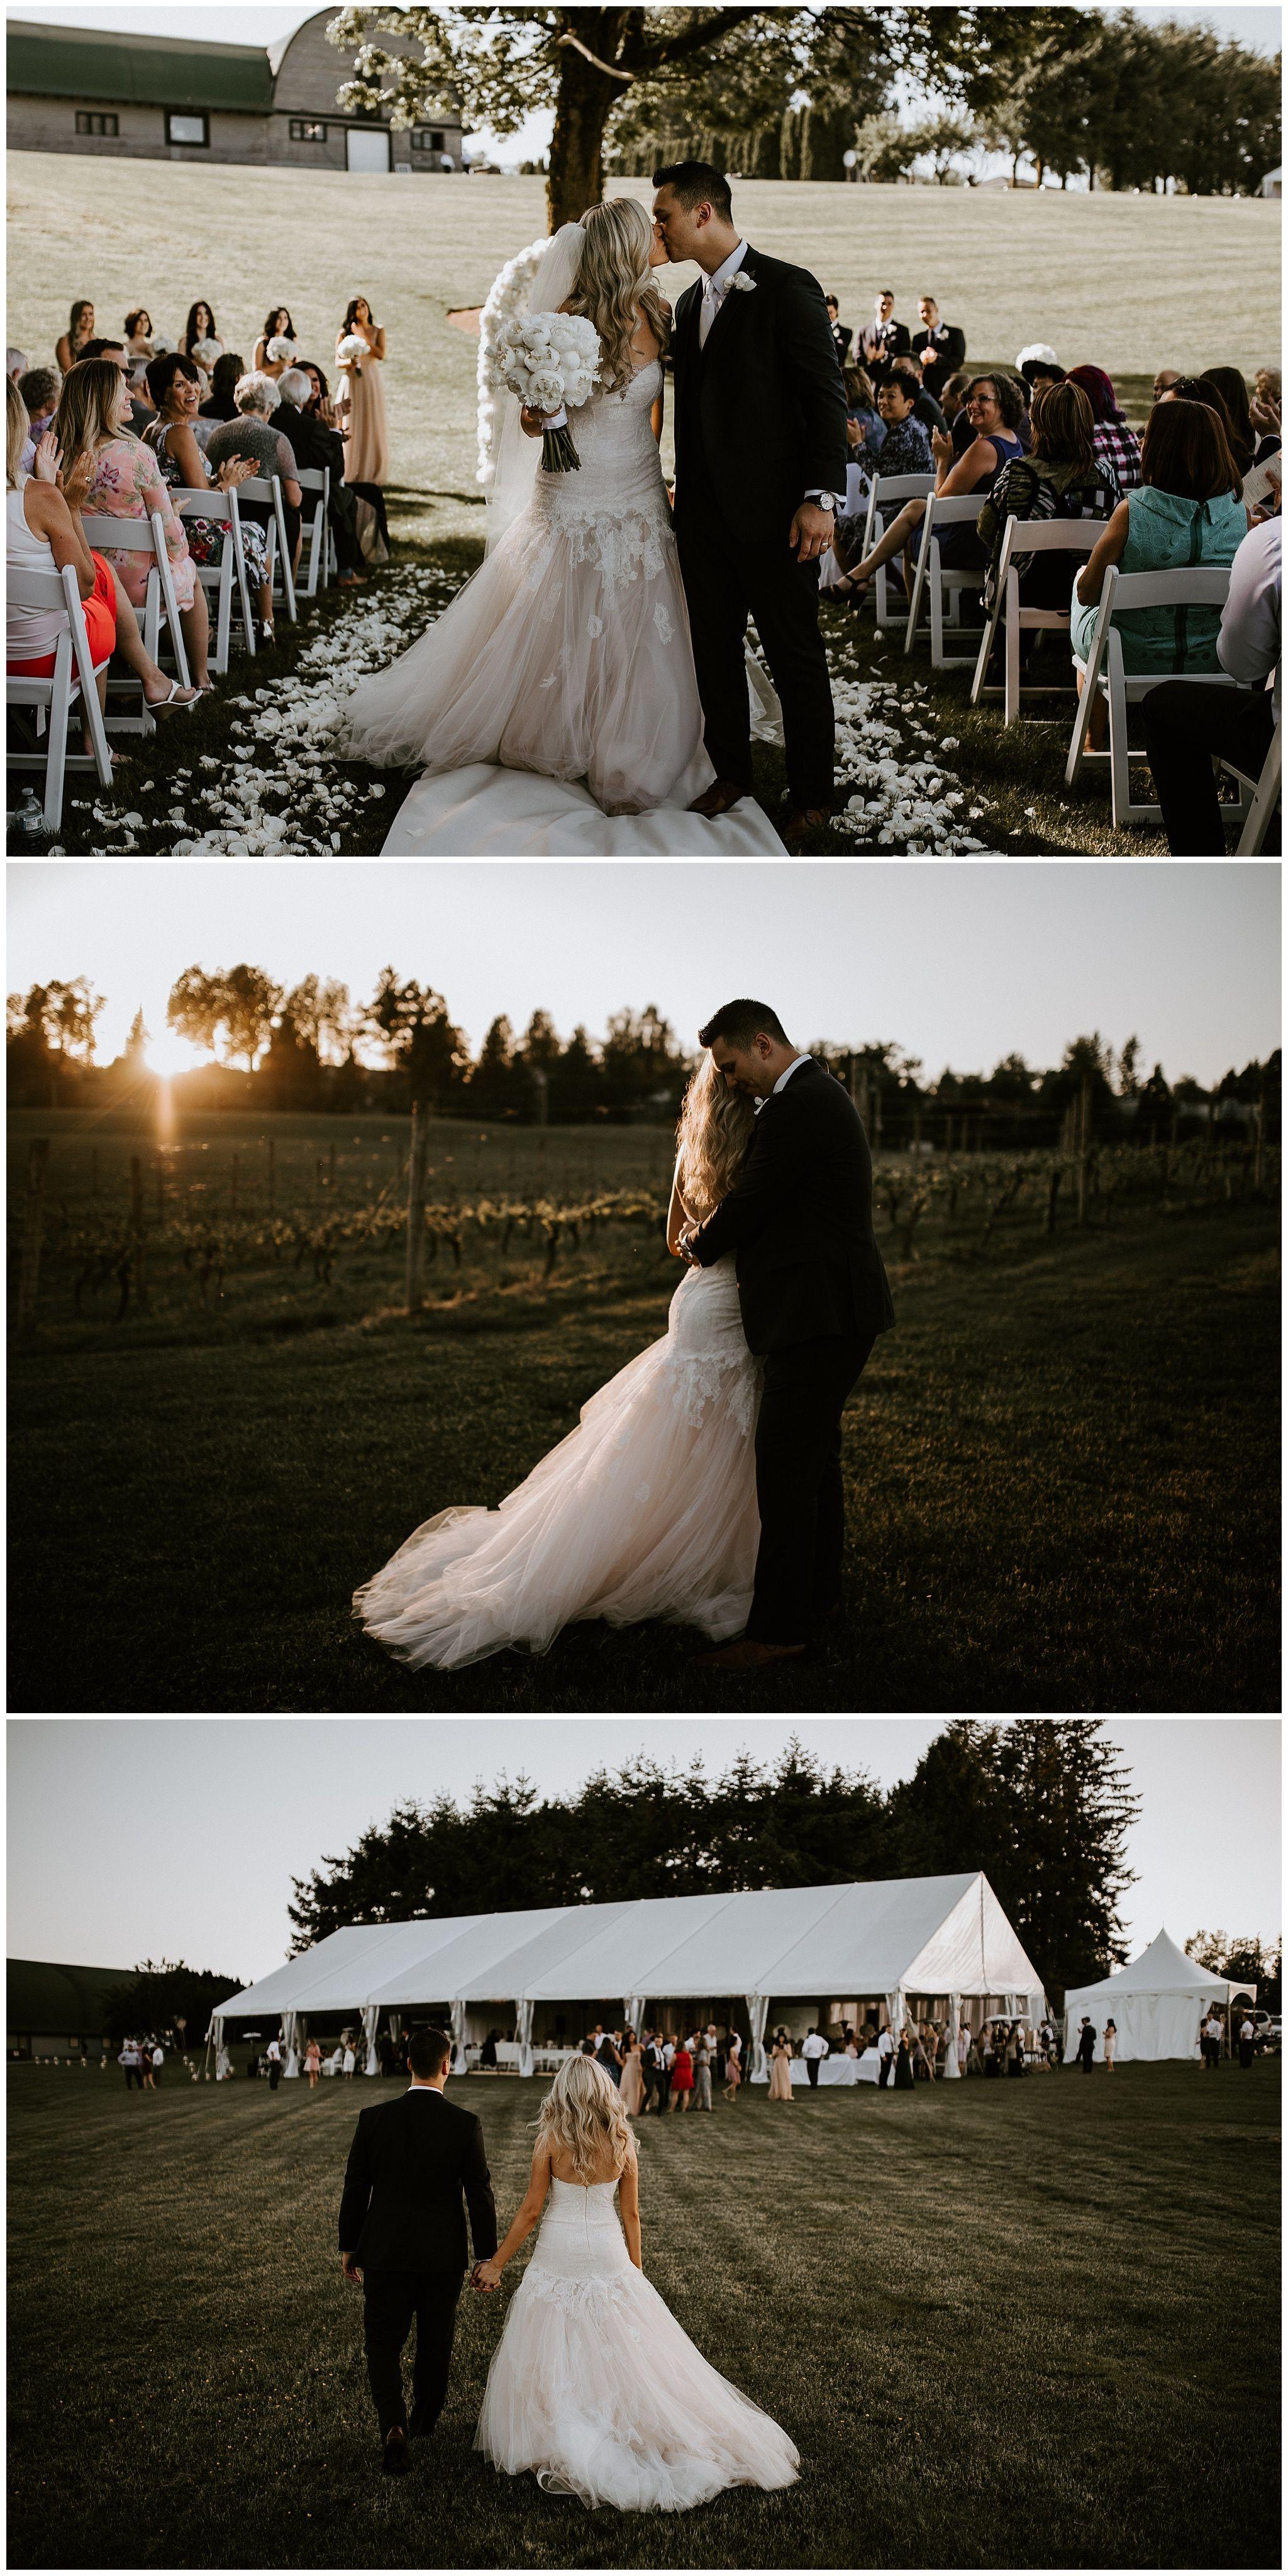 Outdoor Wedding Venues Abbotsford Bc - Chorp Wedding